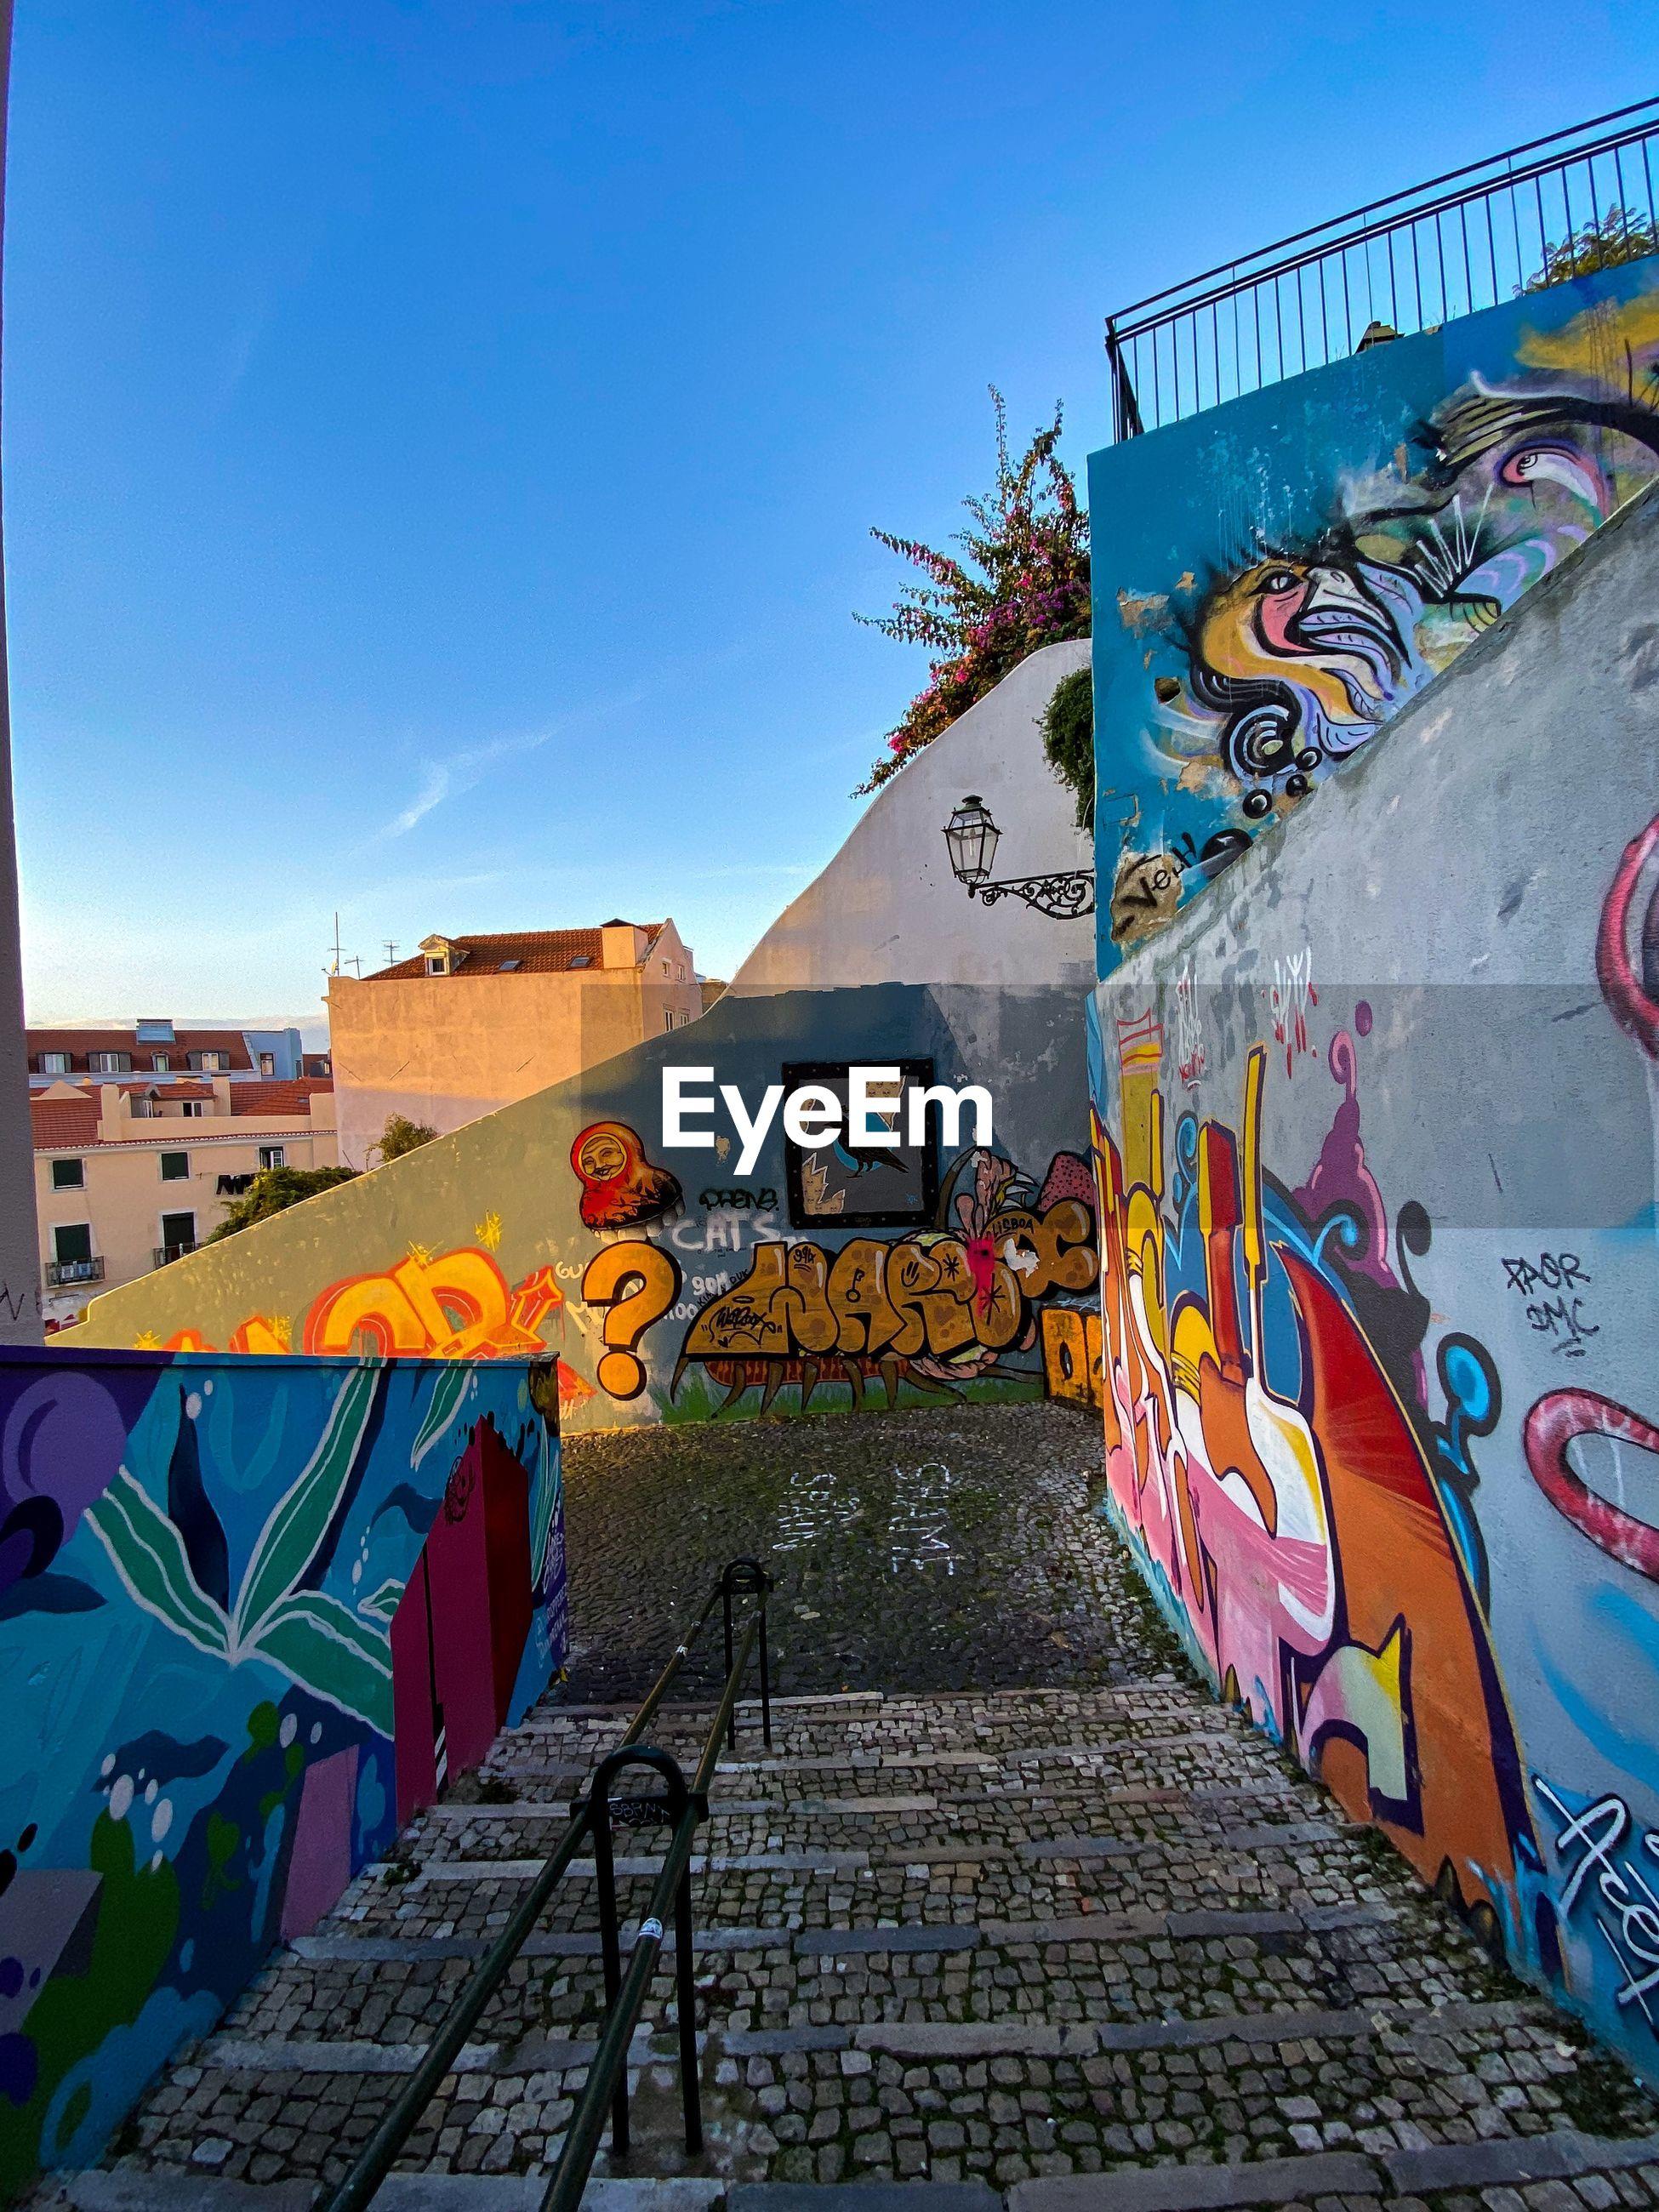 GRAFFITI ON BUILDING WALL AGAINST SKY